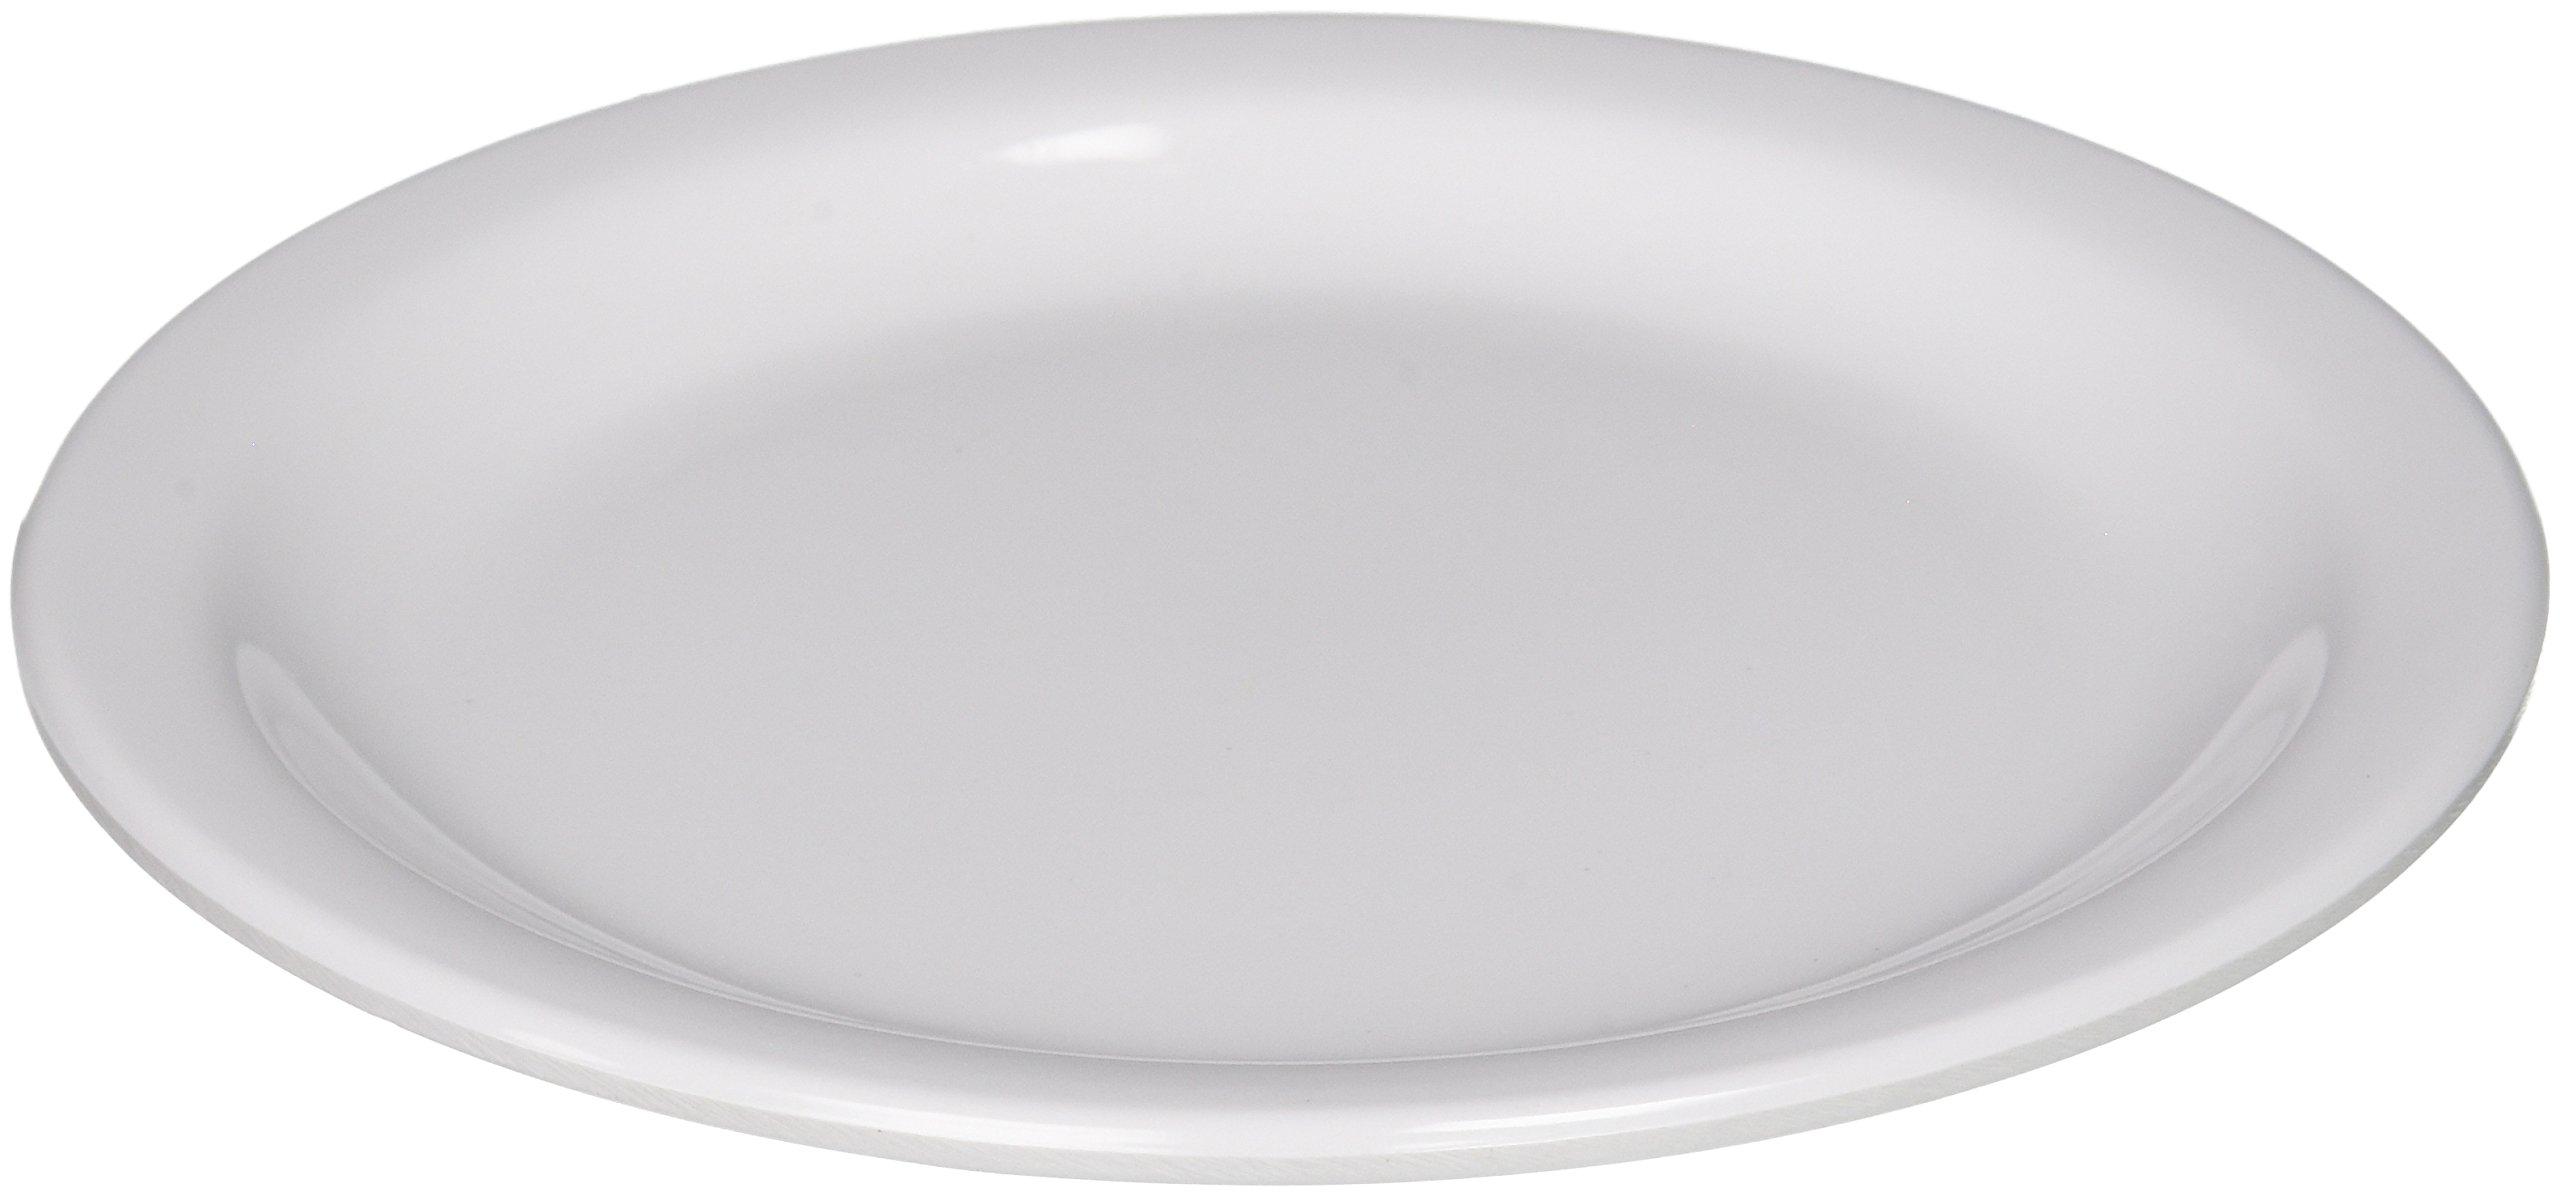 Winco MMPR-6W Round Melamine Plate, 6.5-Inch, White ( 12 Count )